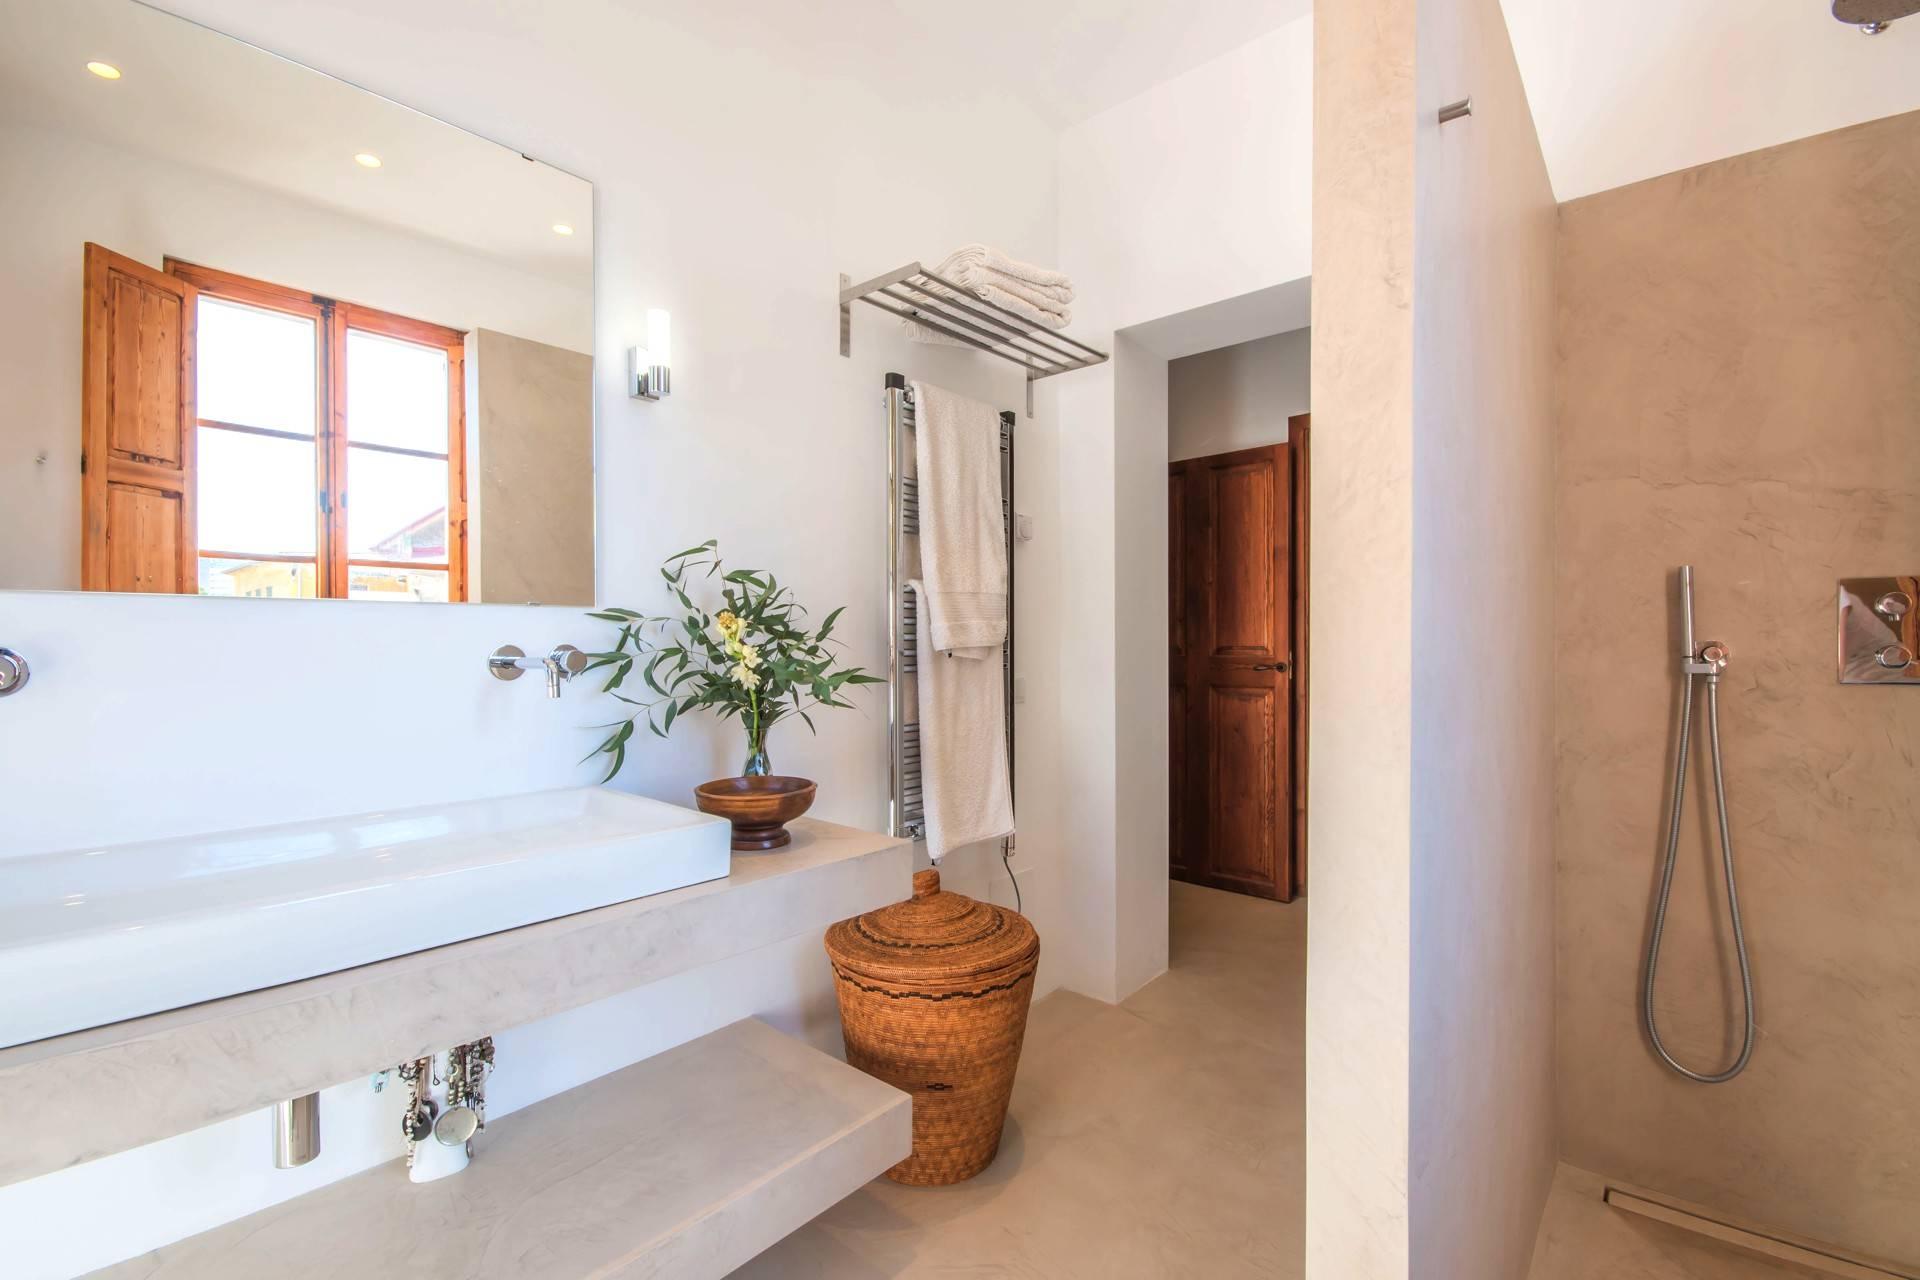 01-257 Luxus Ferienhaus Mallorca Südwesten Bild 18